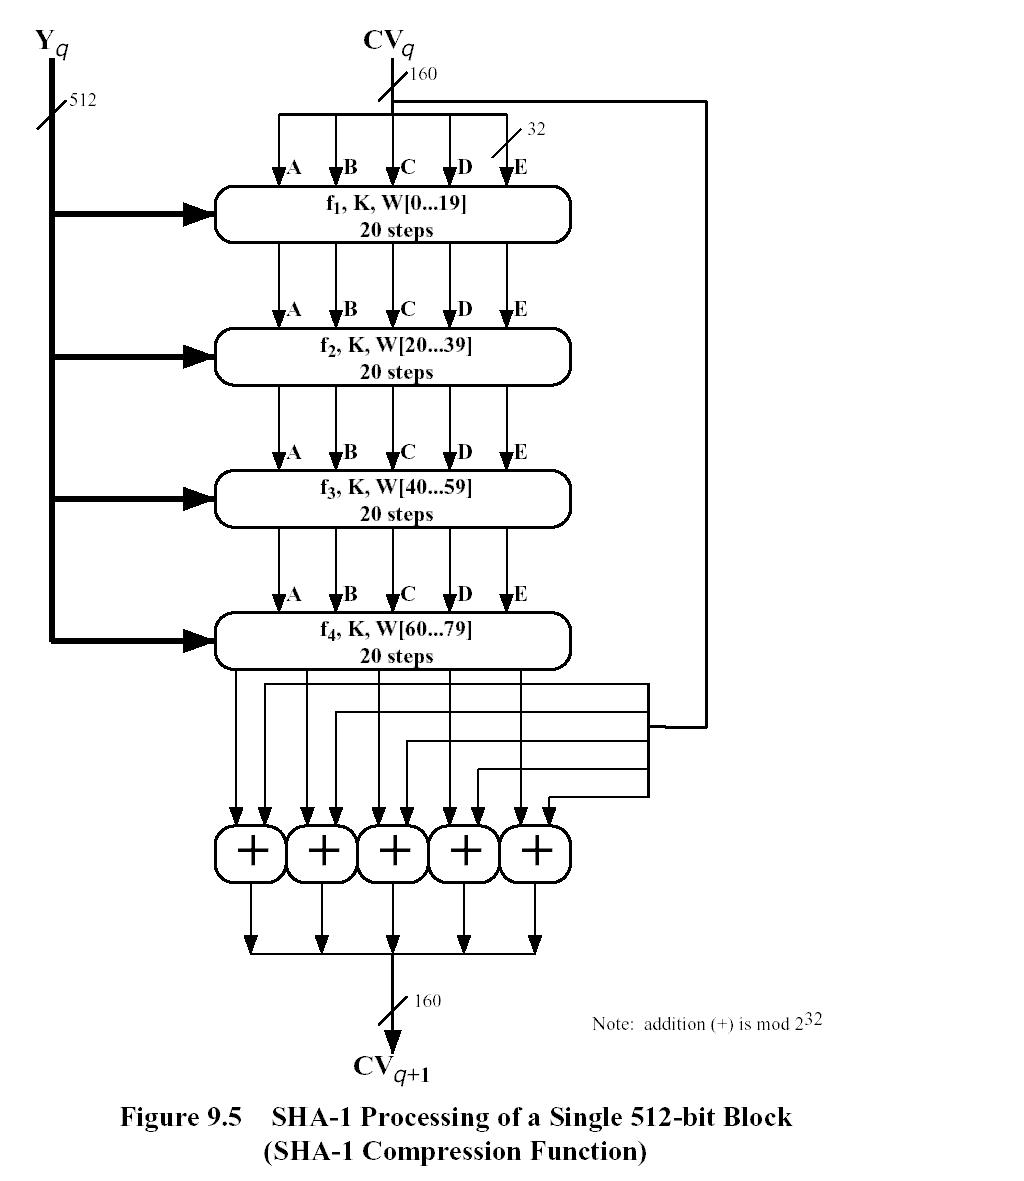 TRU_SCIENCE & TRU_TECHNOLOGY: ARTICLE 27